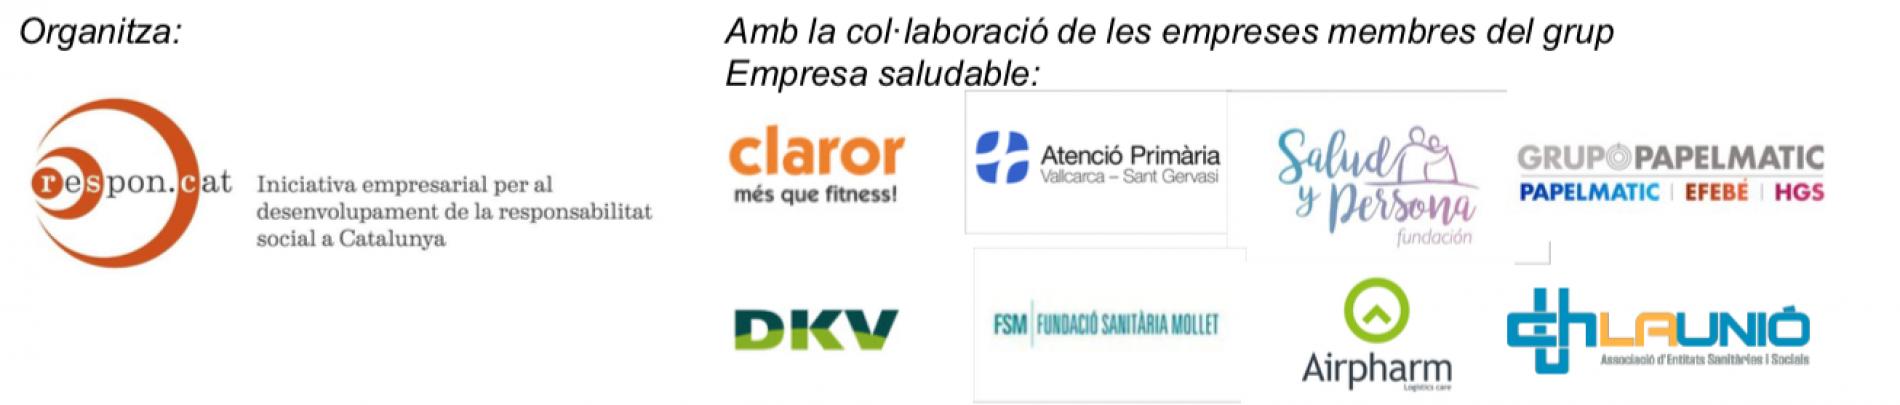 [Jornada] Empresa saludable, empresa responsable